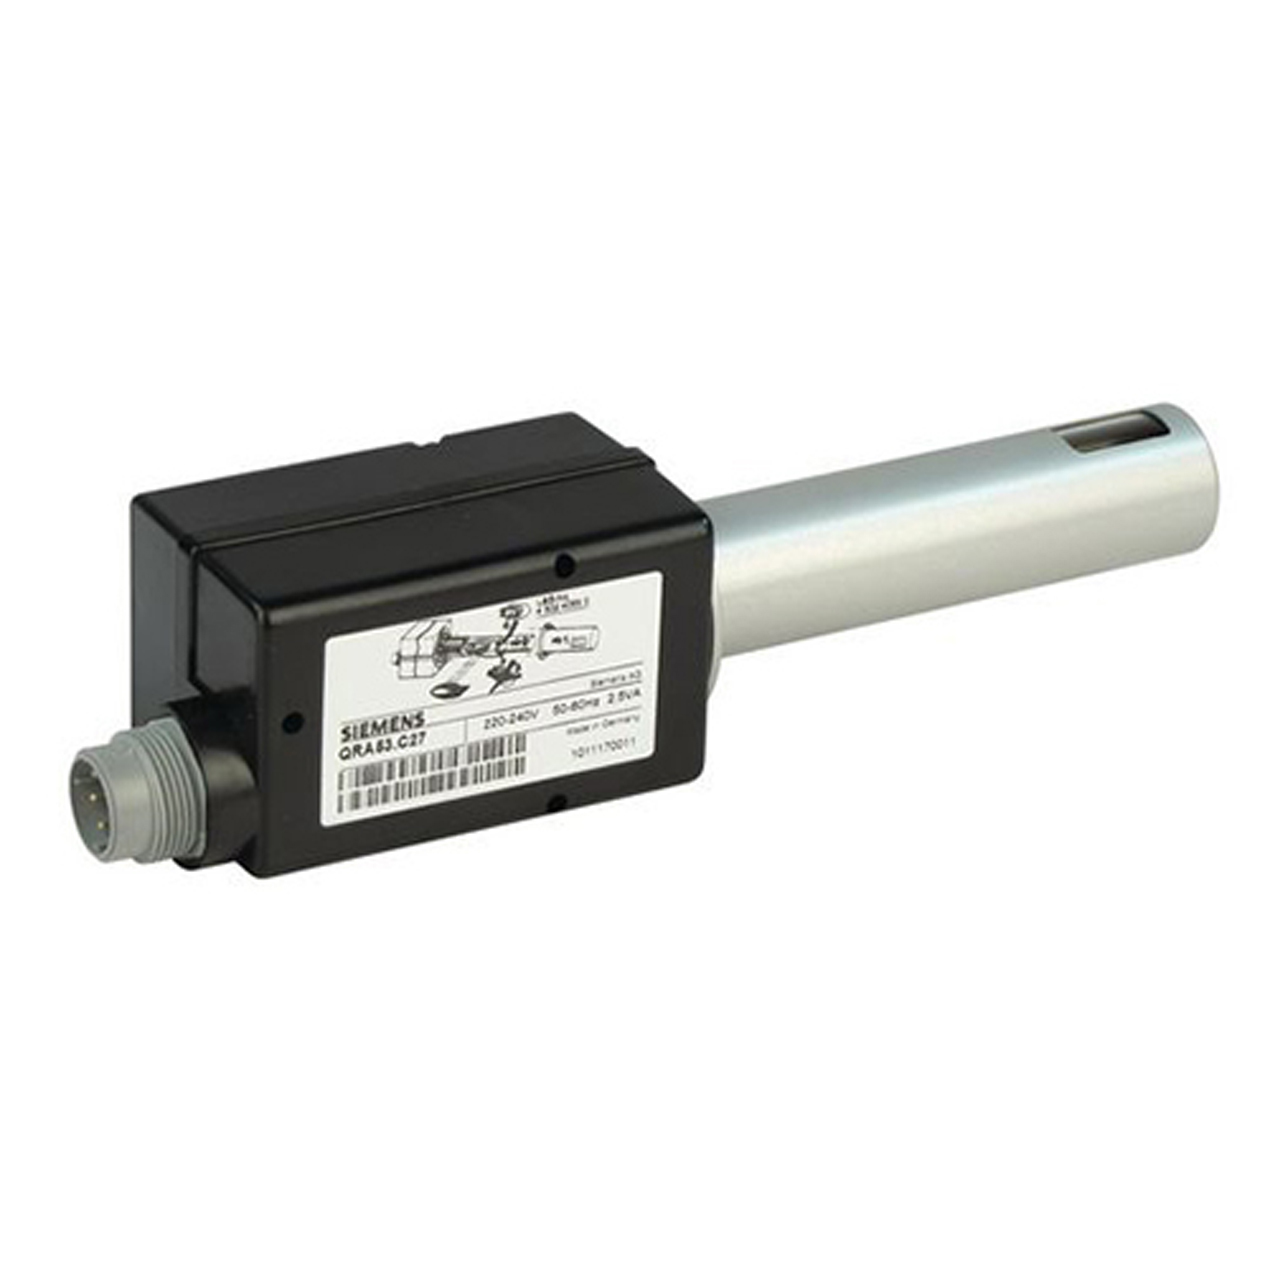 Siemens QRA53.C27 UV CELL